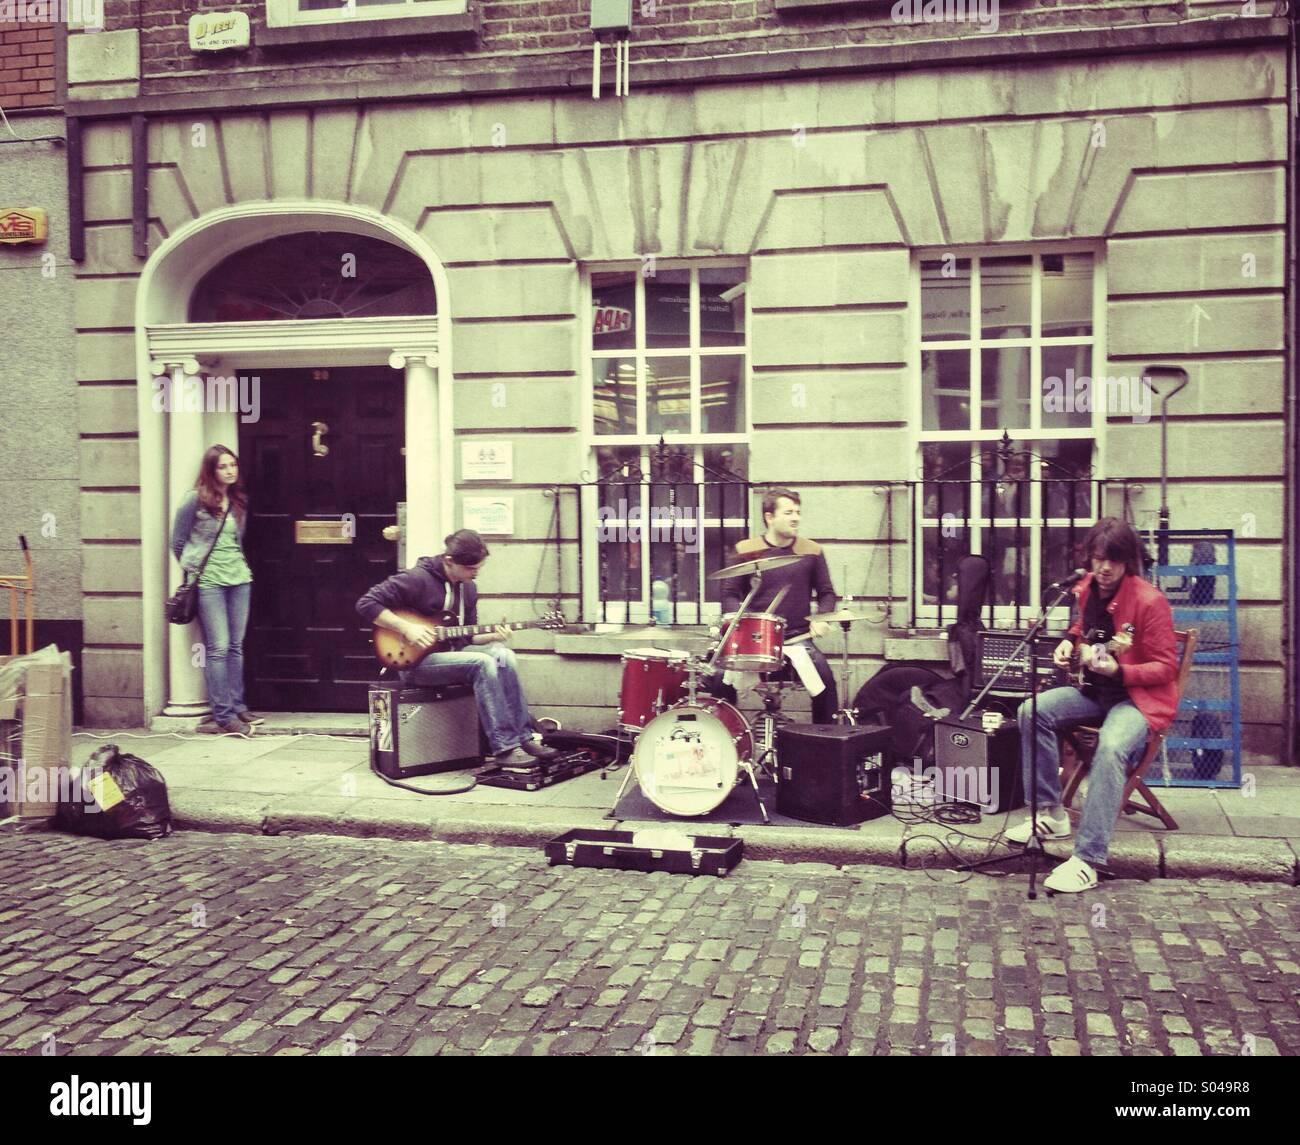 street-performance-S049R8.jpg